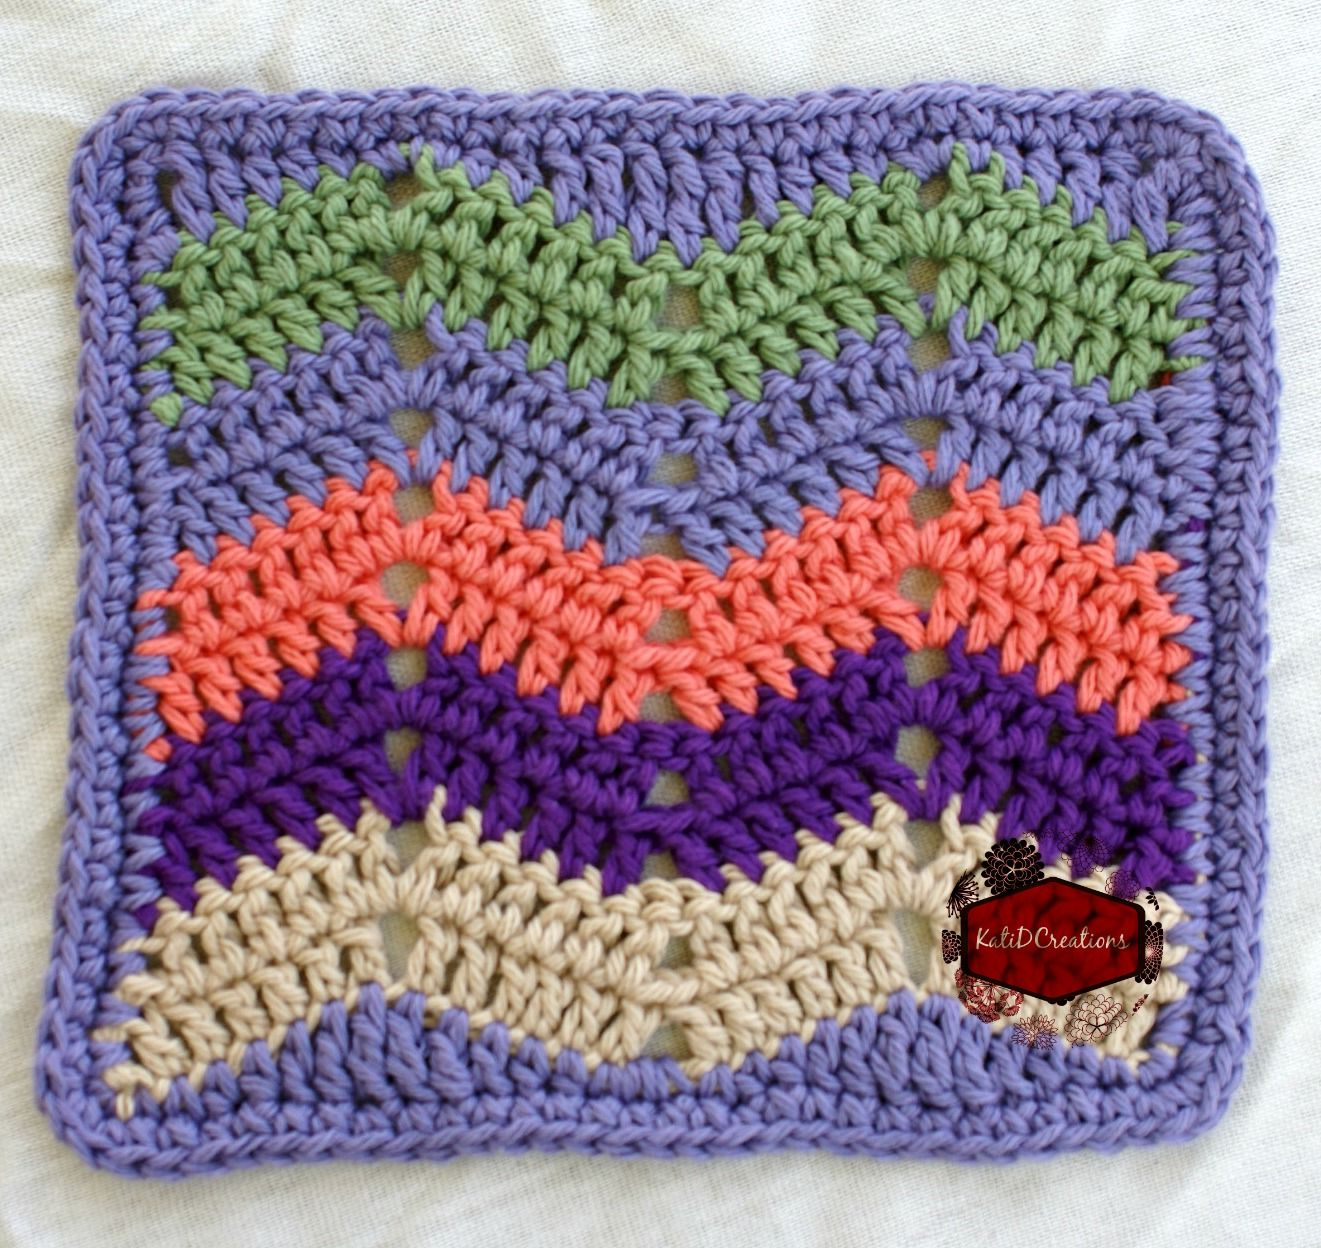 Free crochet pattern chevron washcloth katidcreations diy free crochet pattern chevron washcloth katidcreations bankloansurffo Gallery